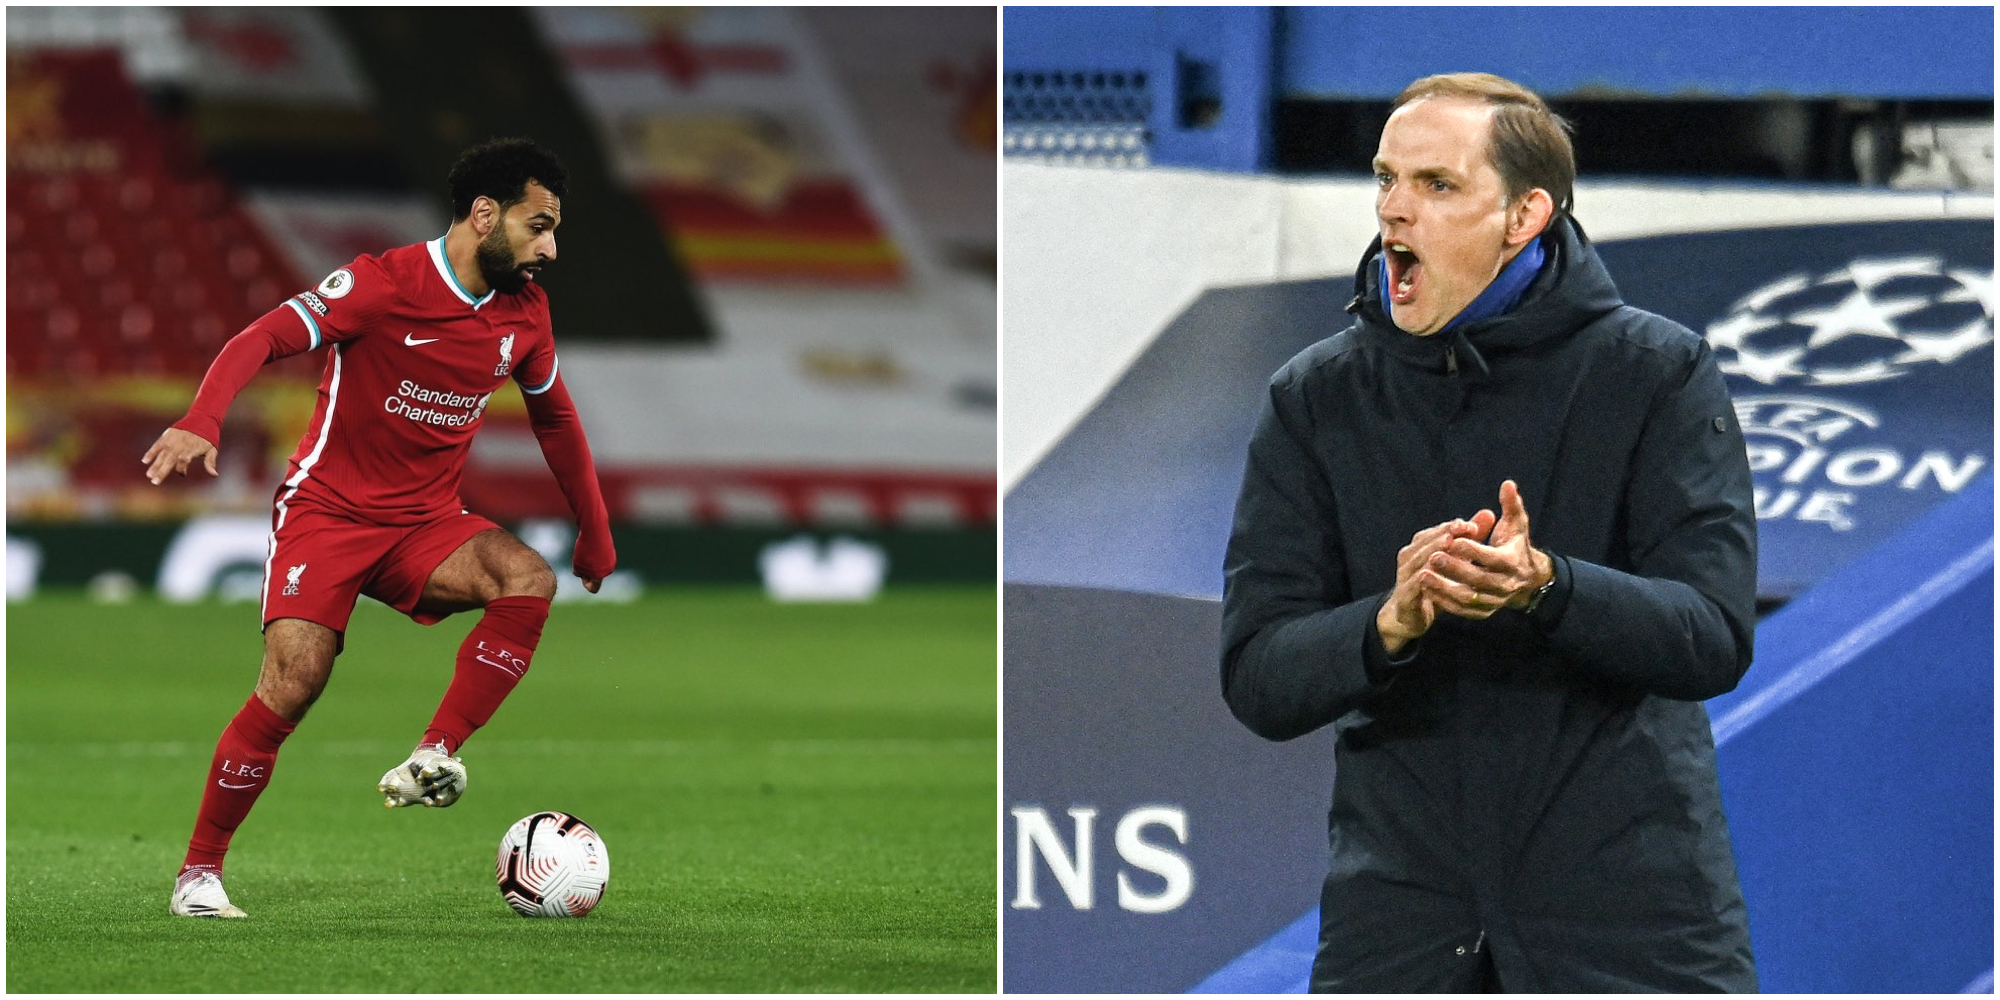 Mo Salah 'on the shortlist of Tuchel and Chelsea', says Christian Falk